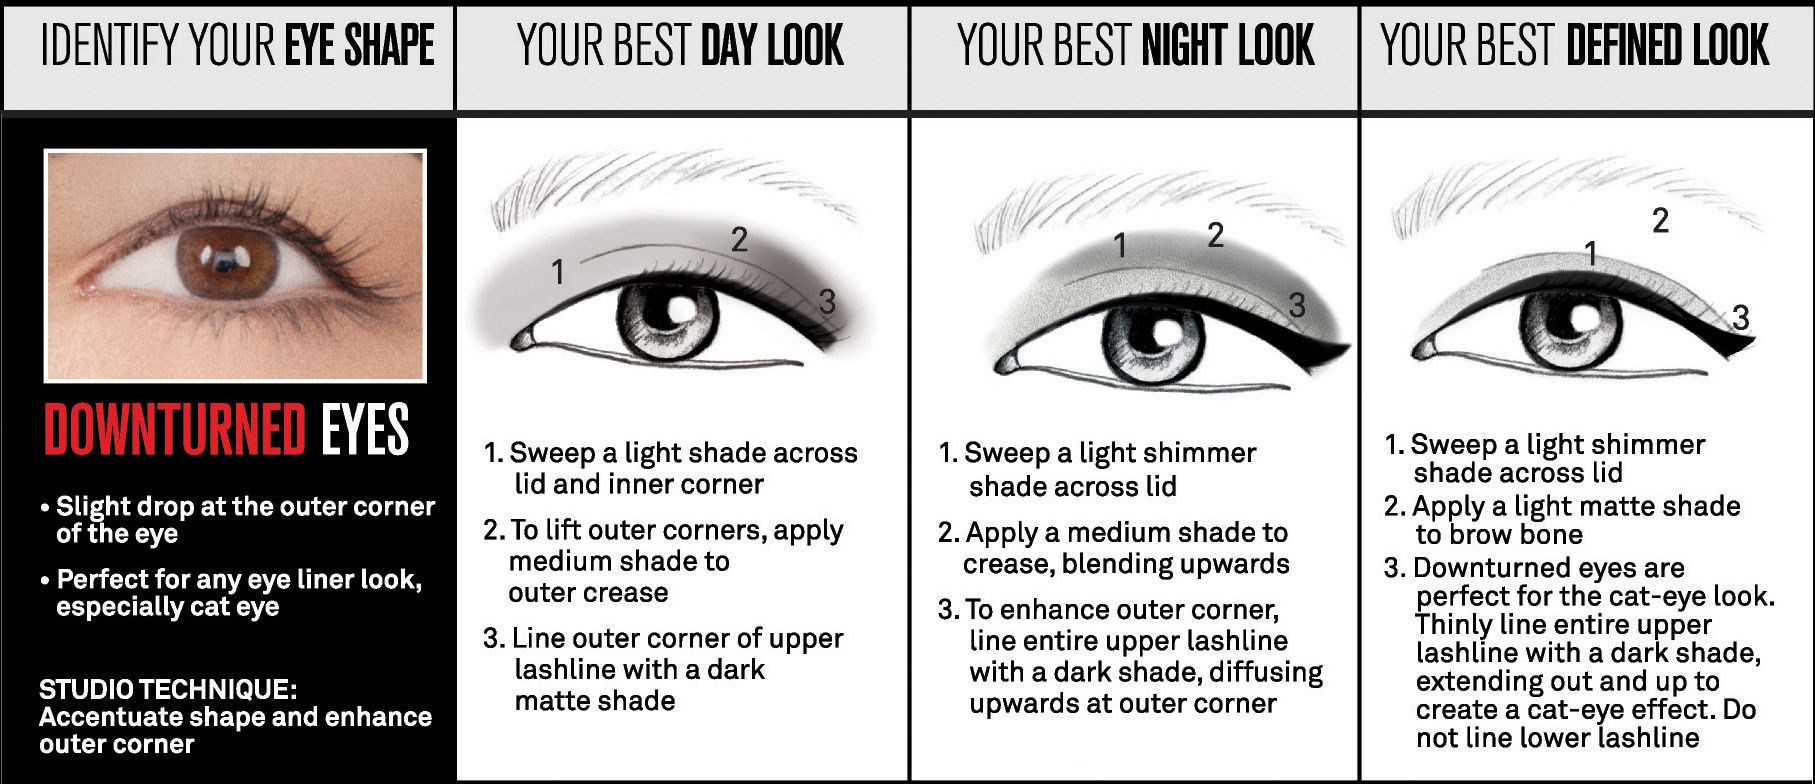 HOW TO APPLY MAKEUP FOR YOUR EYE SHAPE (A SIX-SHAPE CHART)  Eye